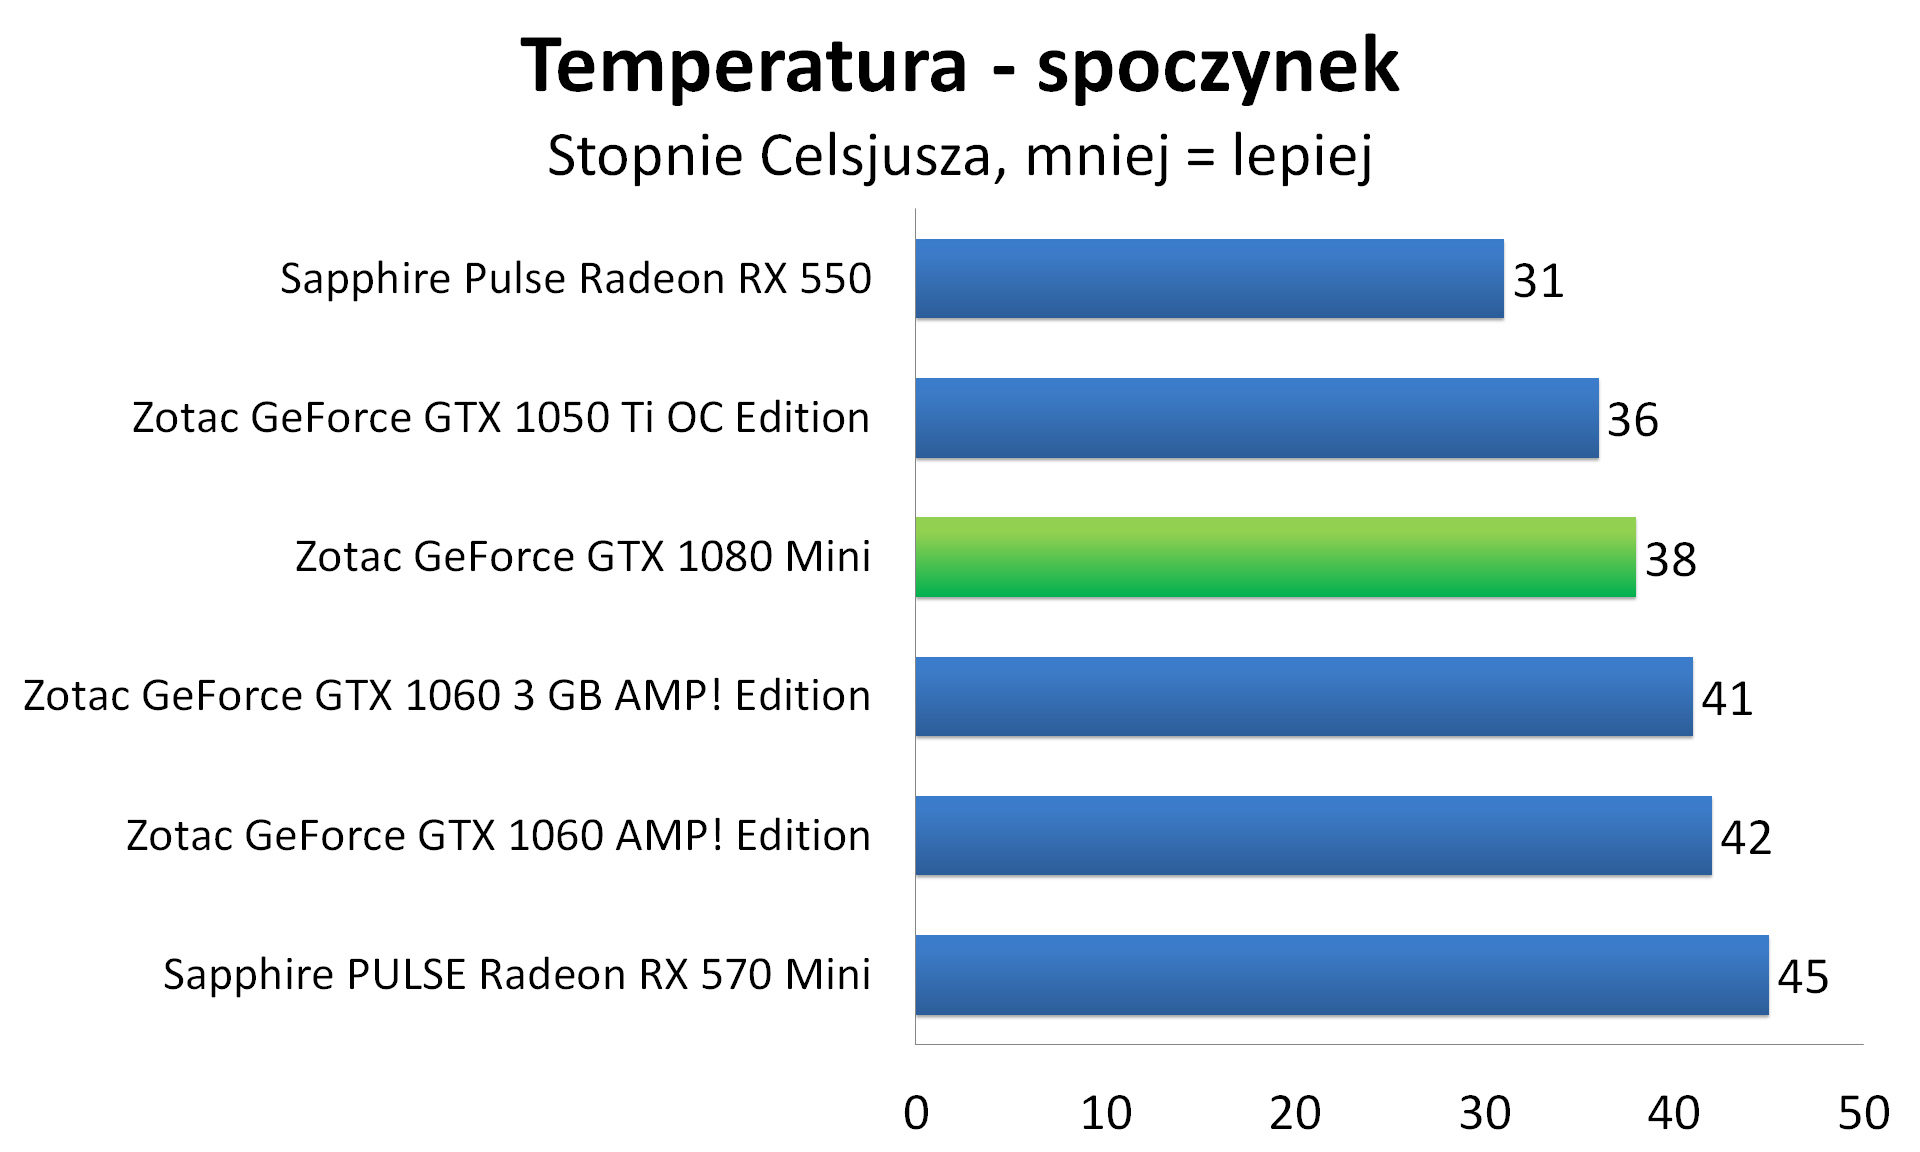 Zotac GeForce GTX 1080 Mini - Temperatura - spoczynek